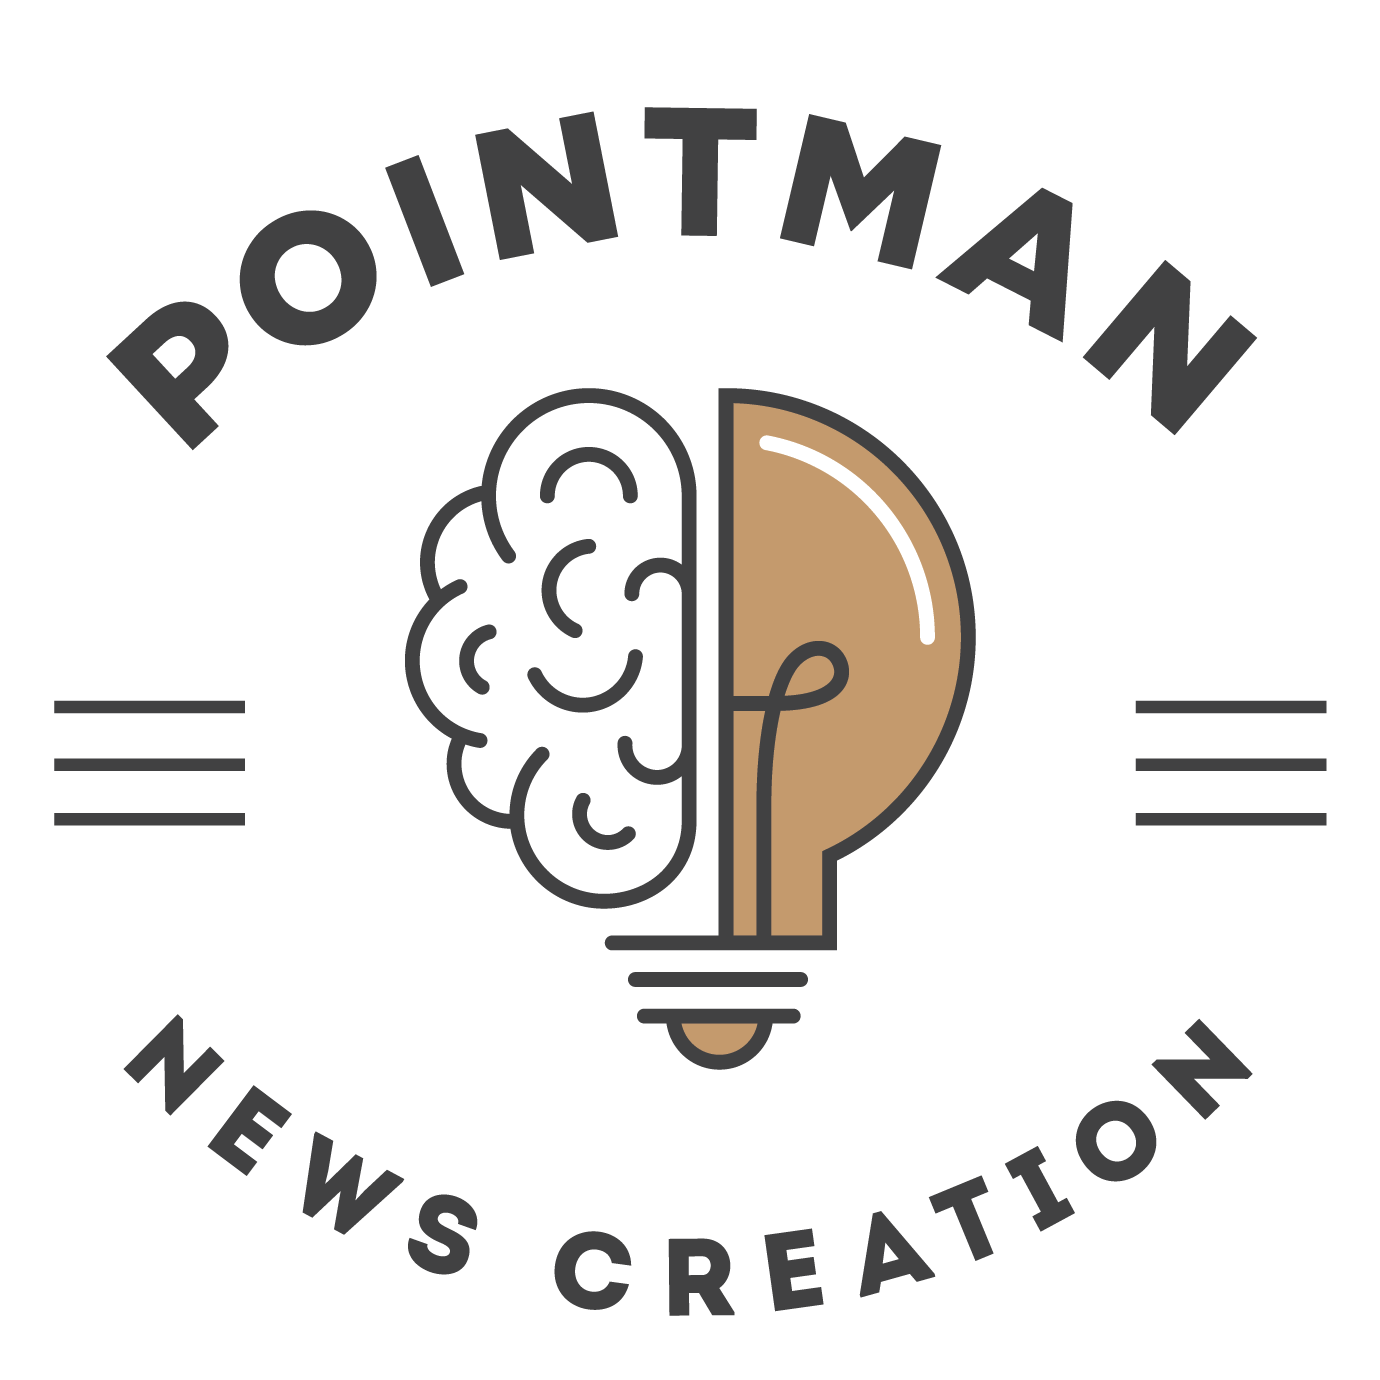 Pointman News Creation